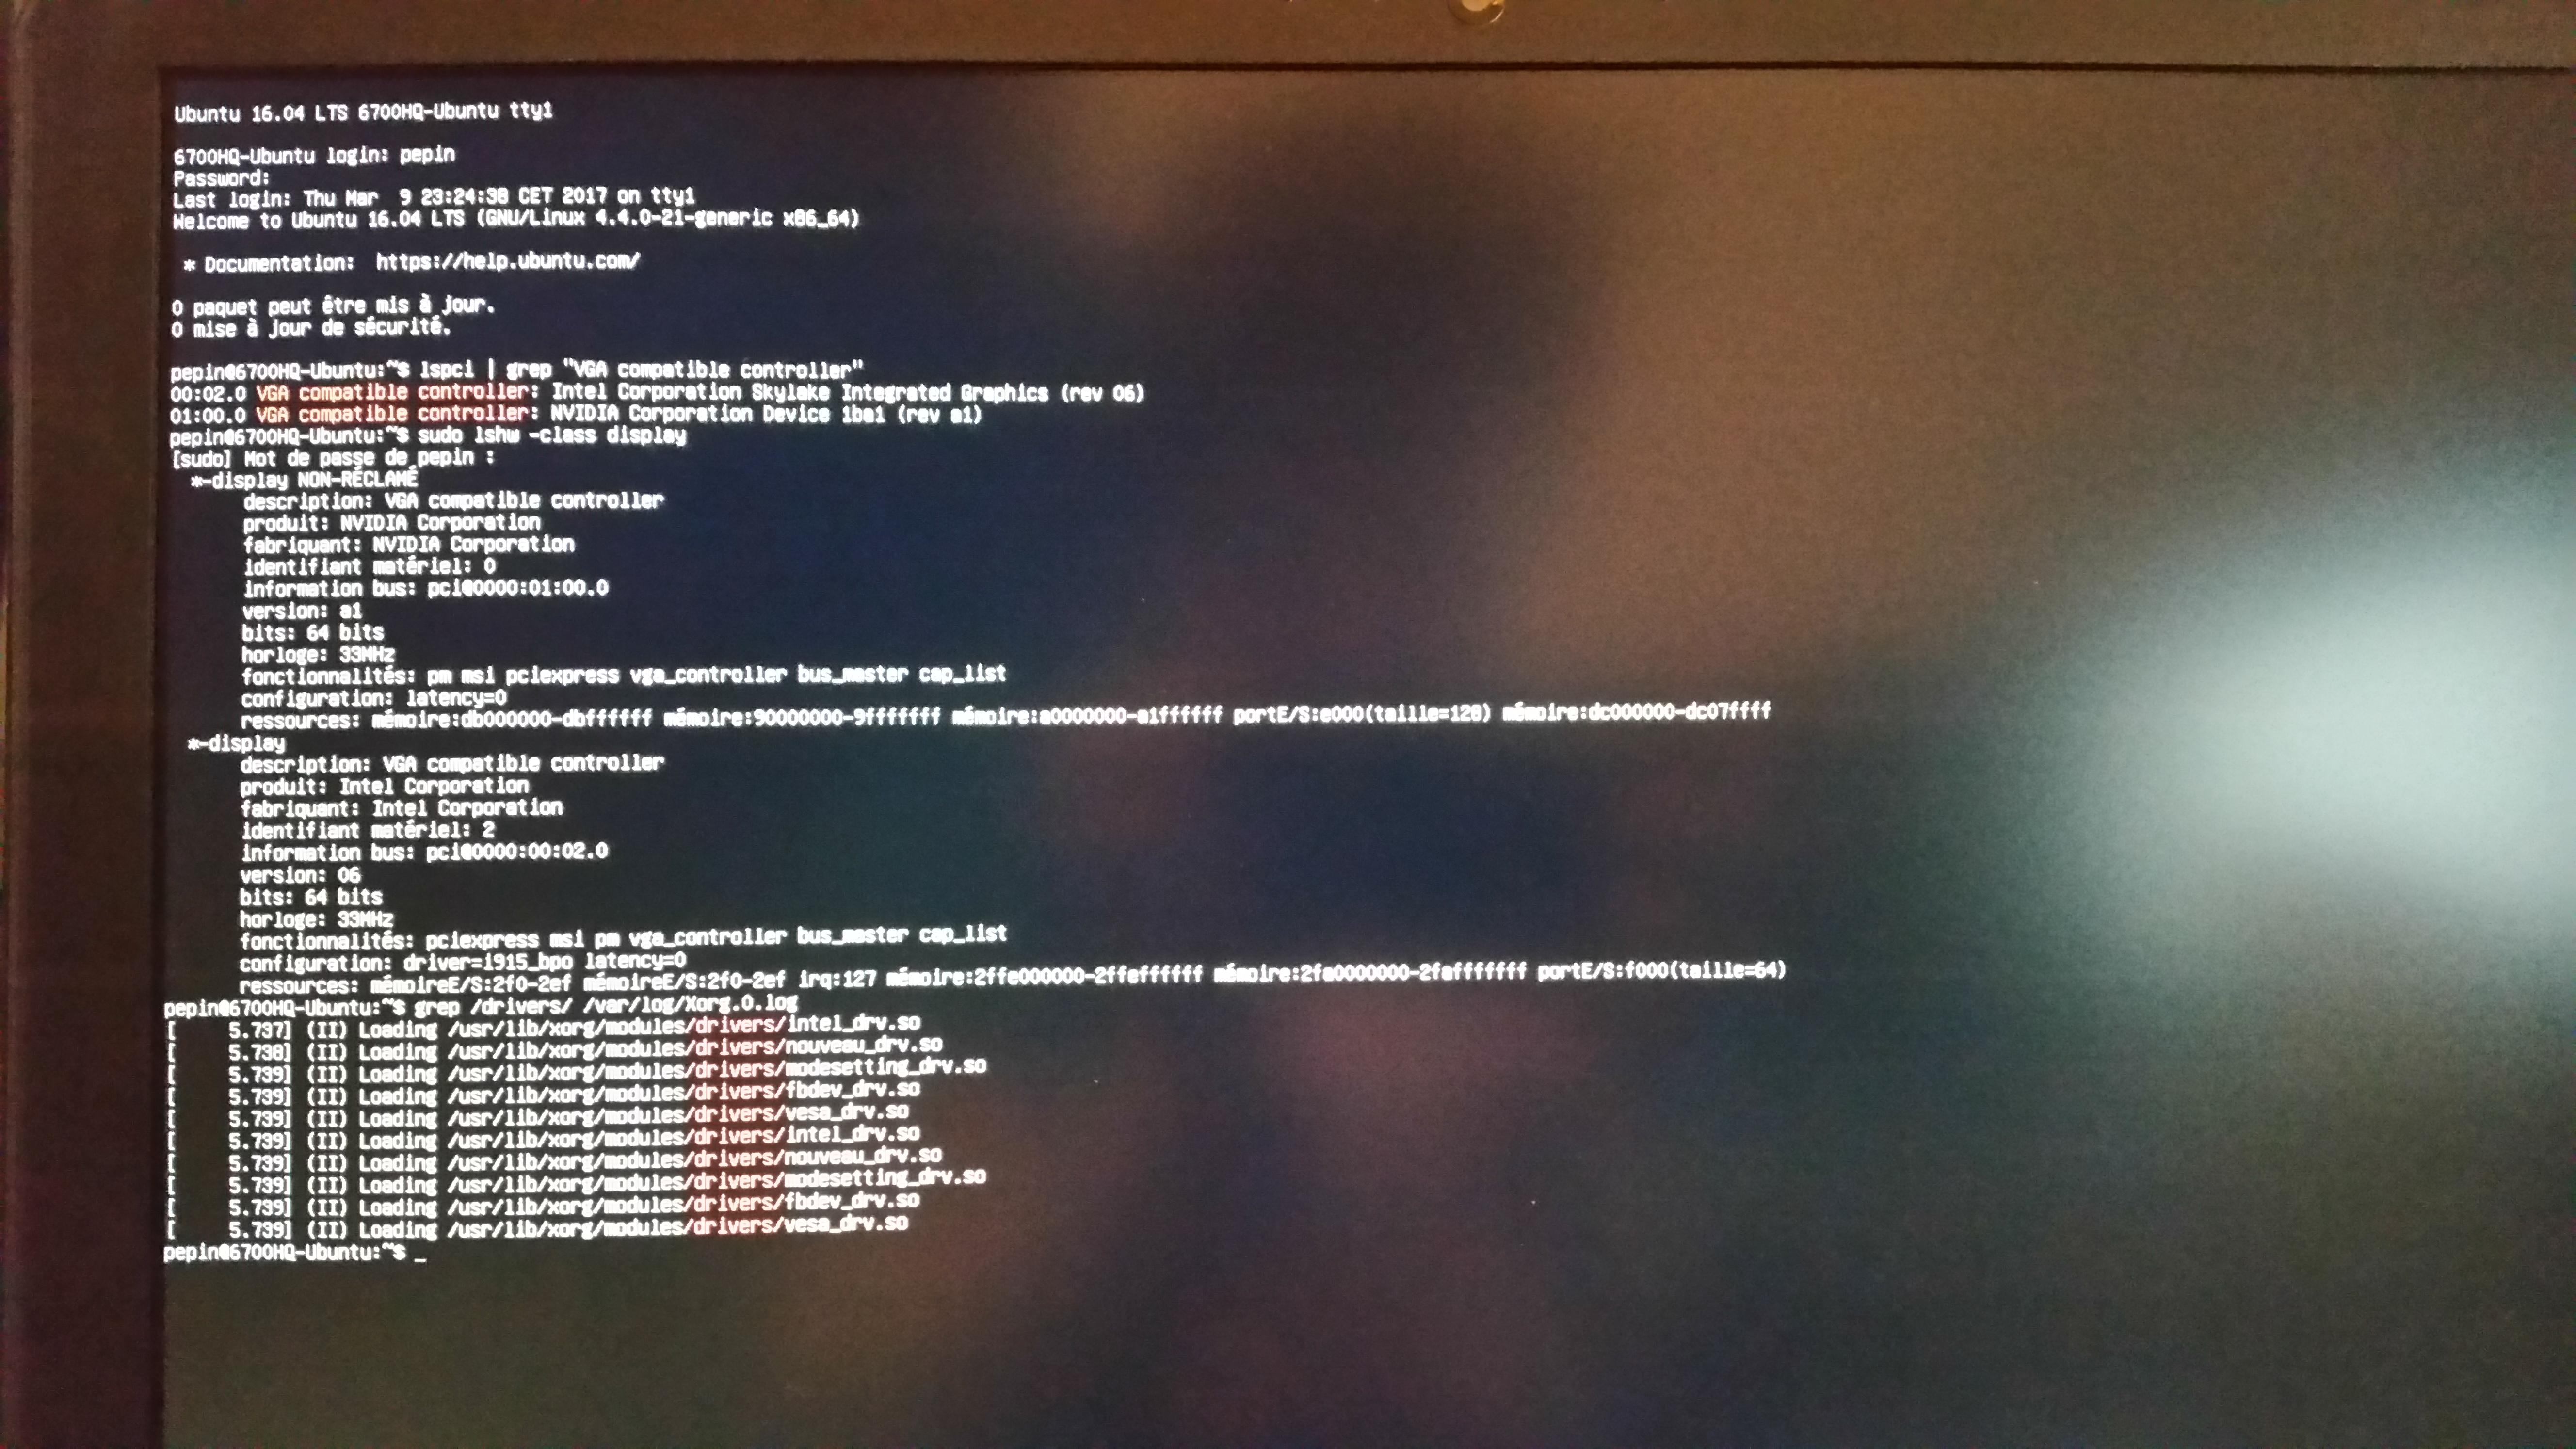 http://image.noelshack.com/fichiers/2017/10/1489155997-20170310-151454.jpg